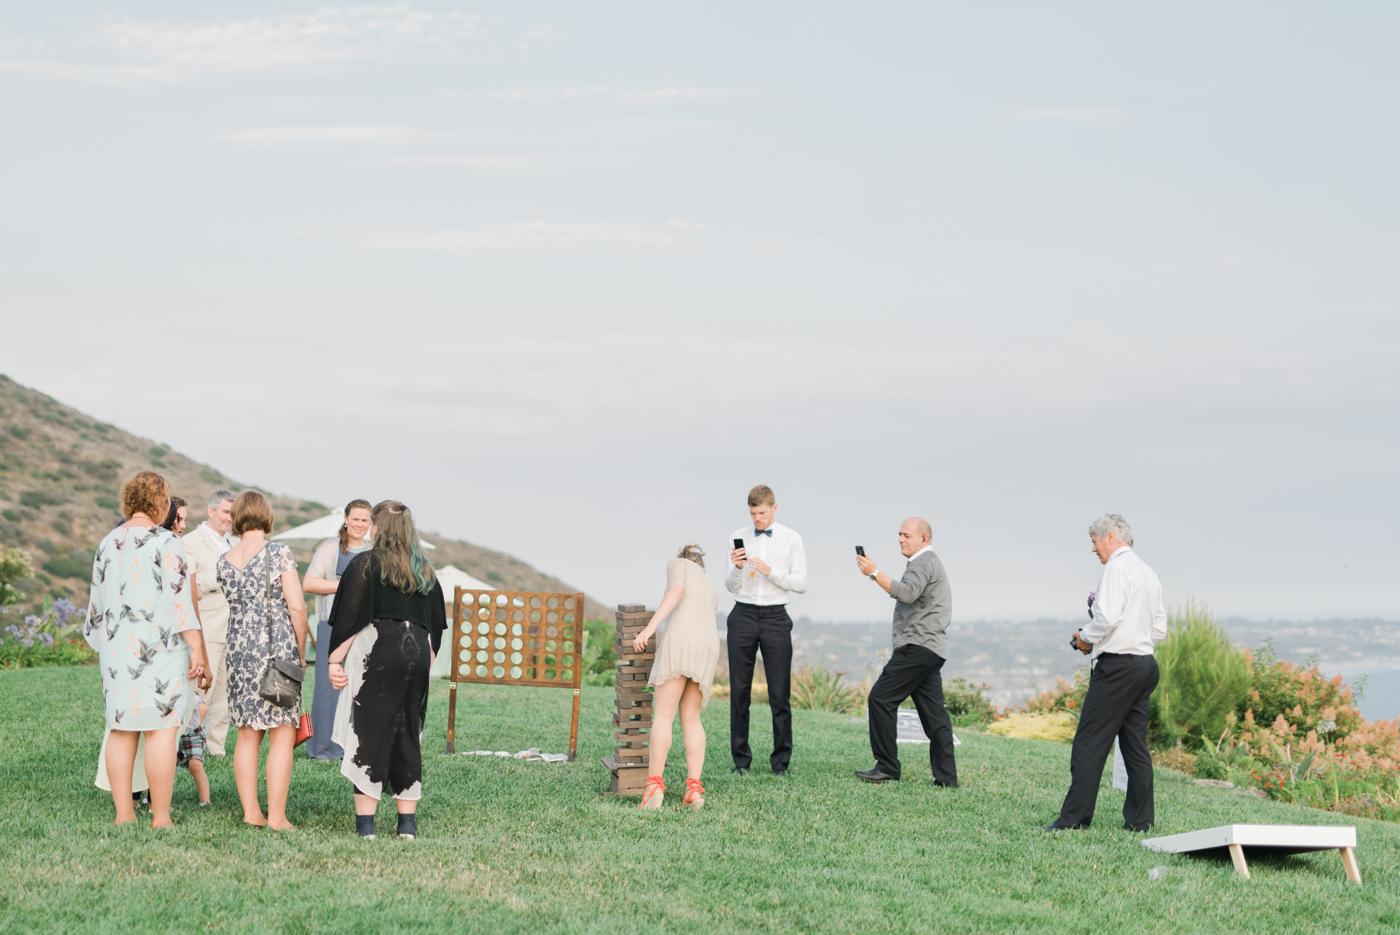 AKP_S&F_Malibu_Wedding_Fine_Art_Photography_Los_Angeles-25_cocktail_hour.jpg